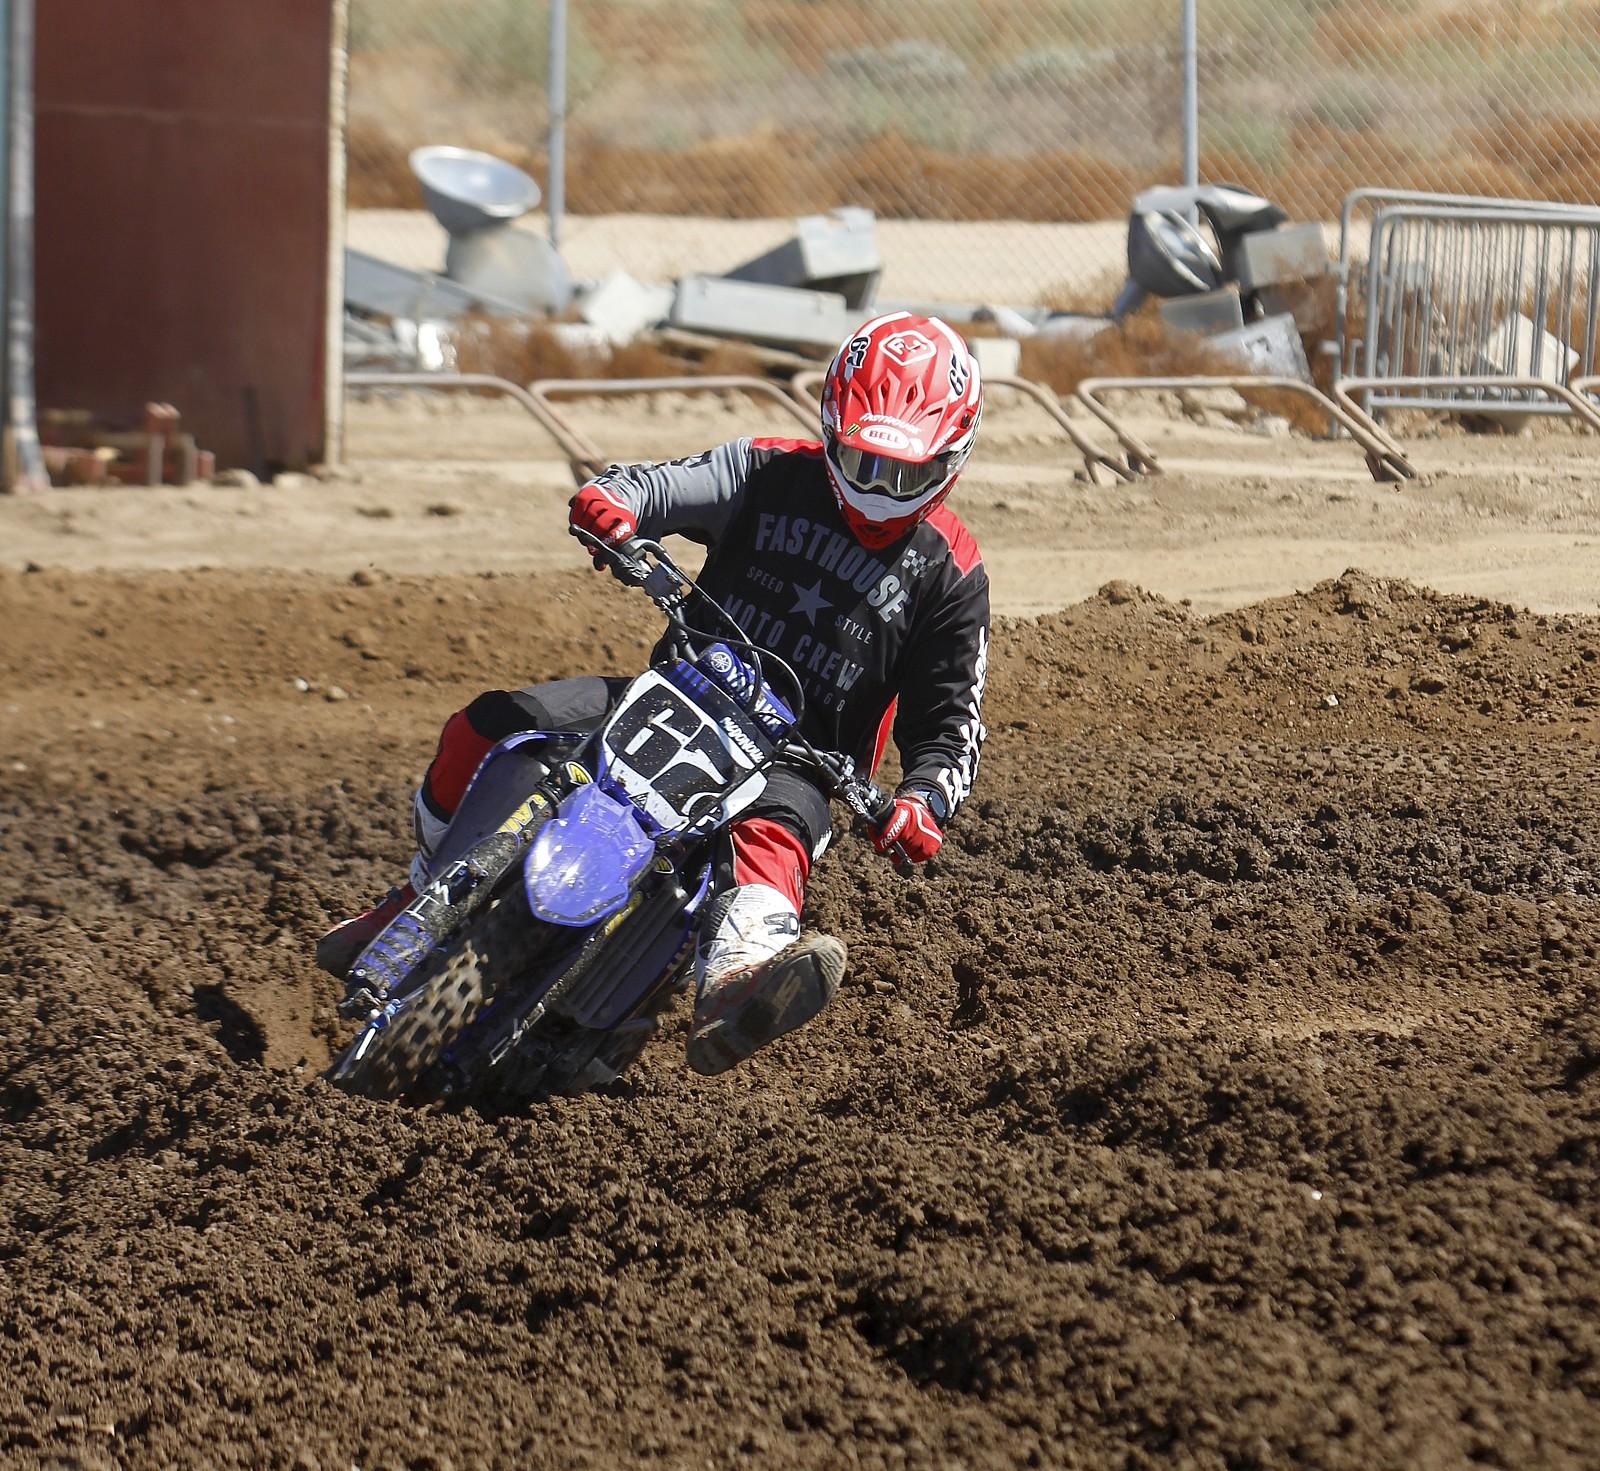 MG 5077 copy - moto67e - Motocross Pictures - Vital MX